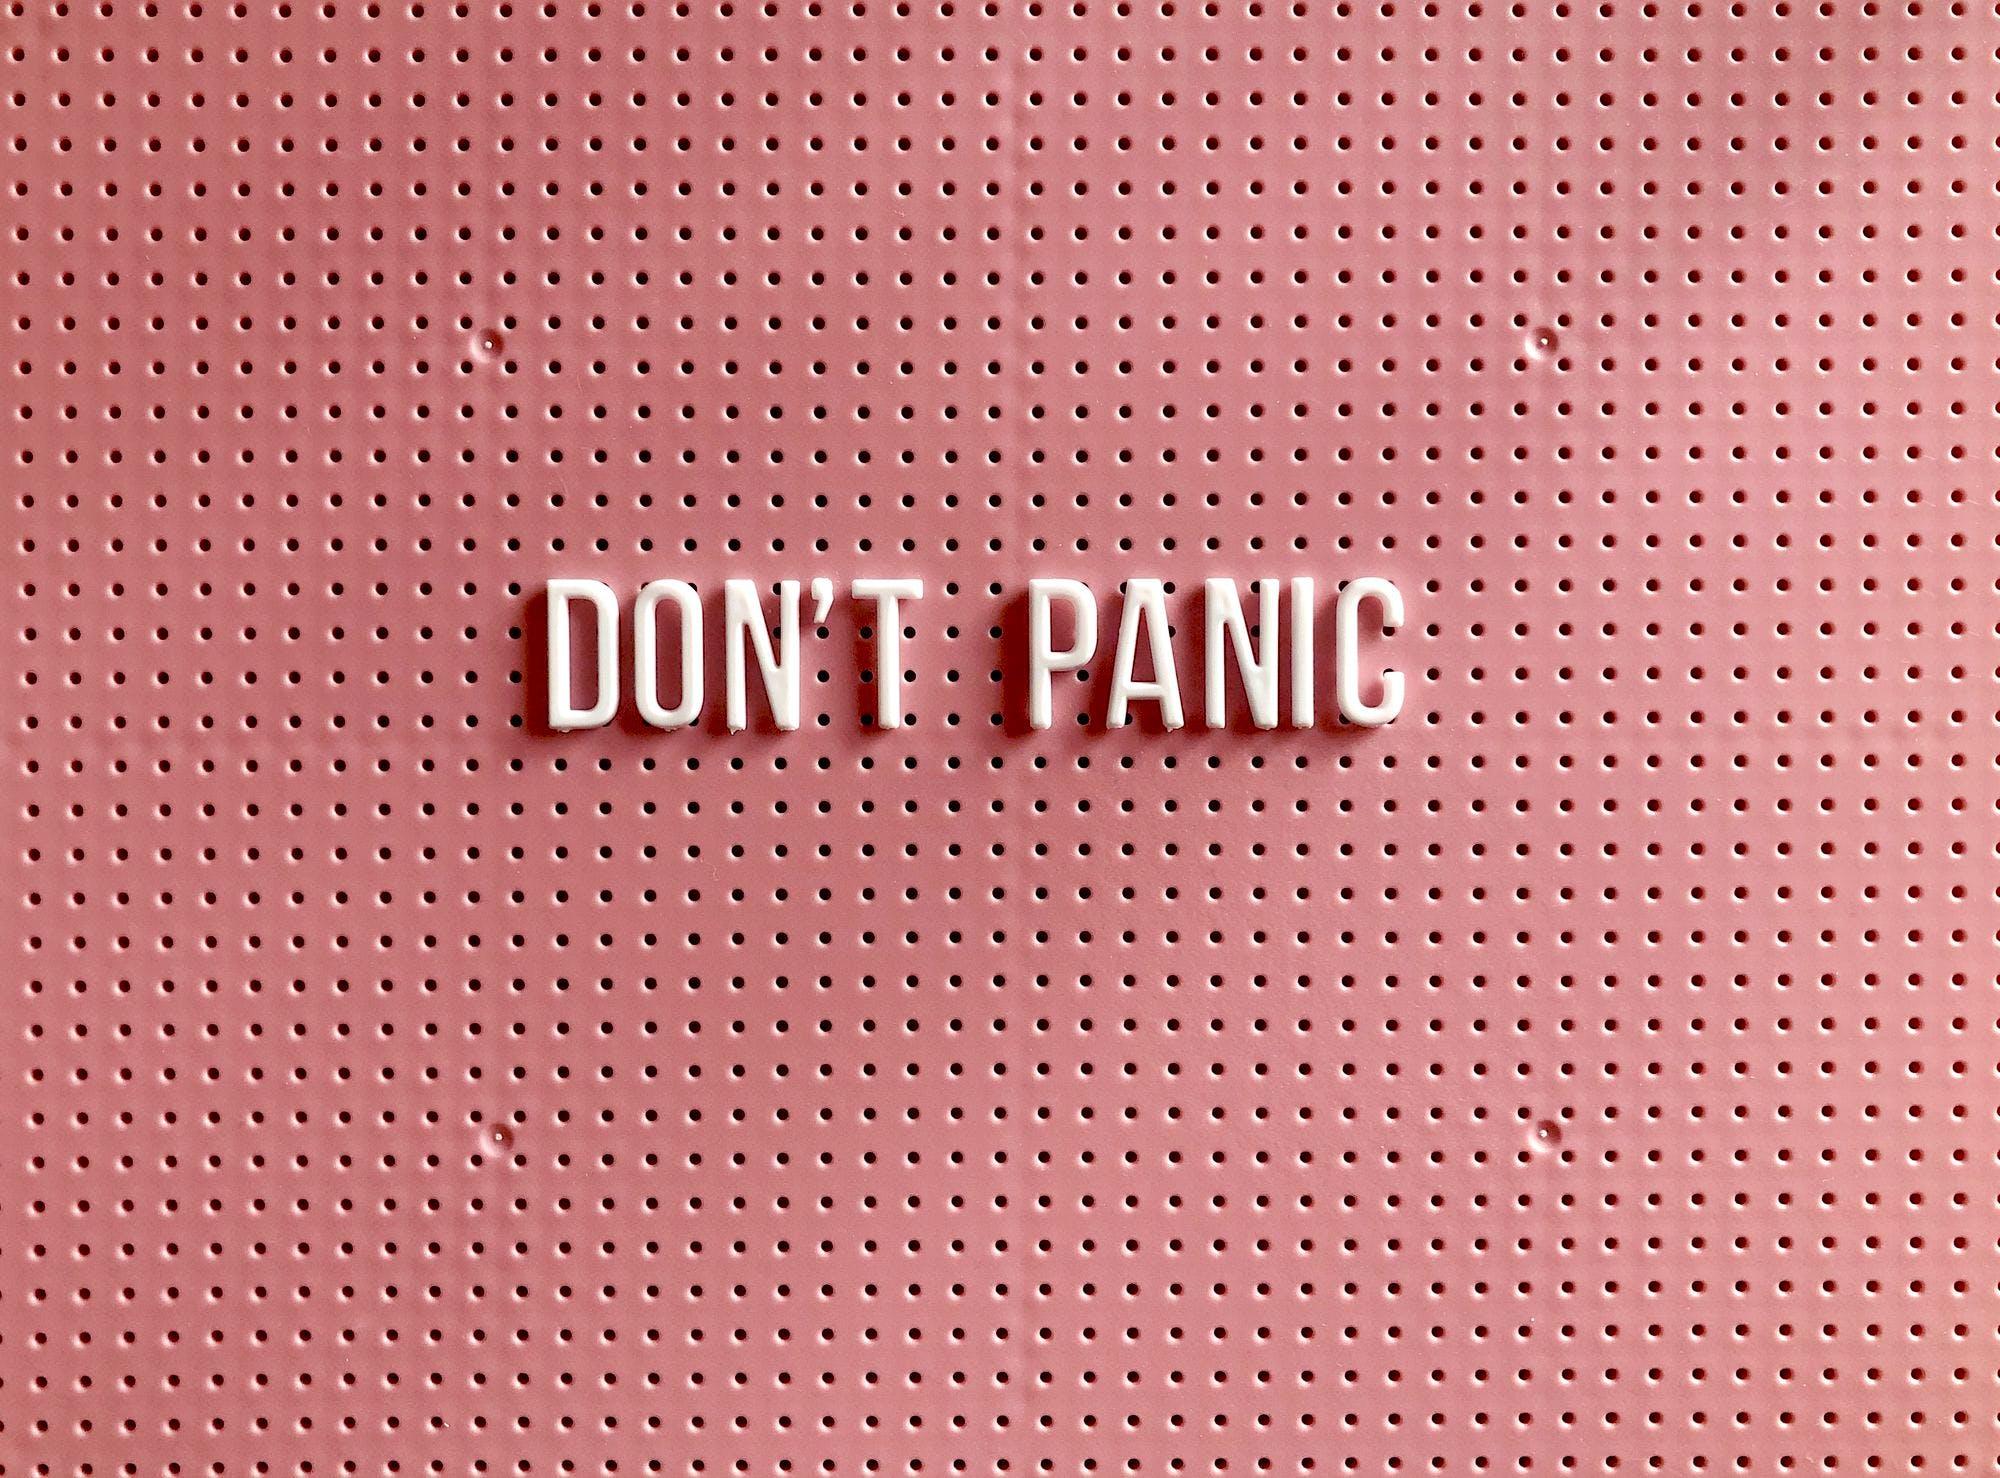 Surviving The Apocalypse, Step 1: Don't Panic